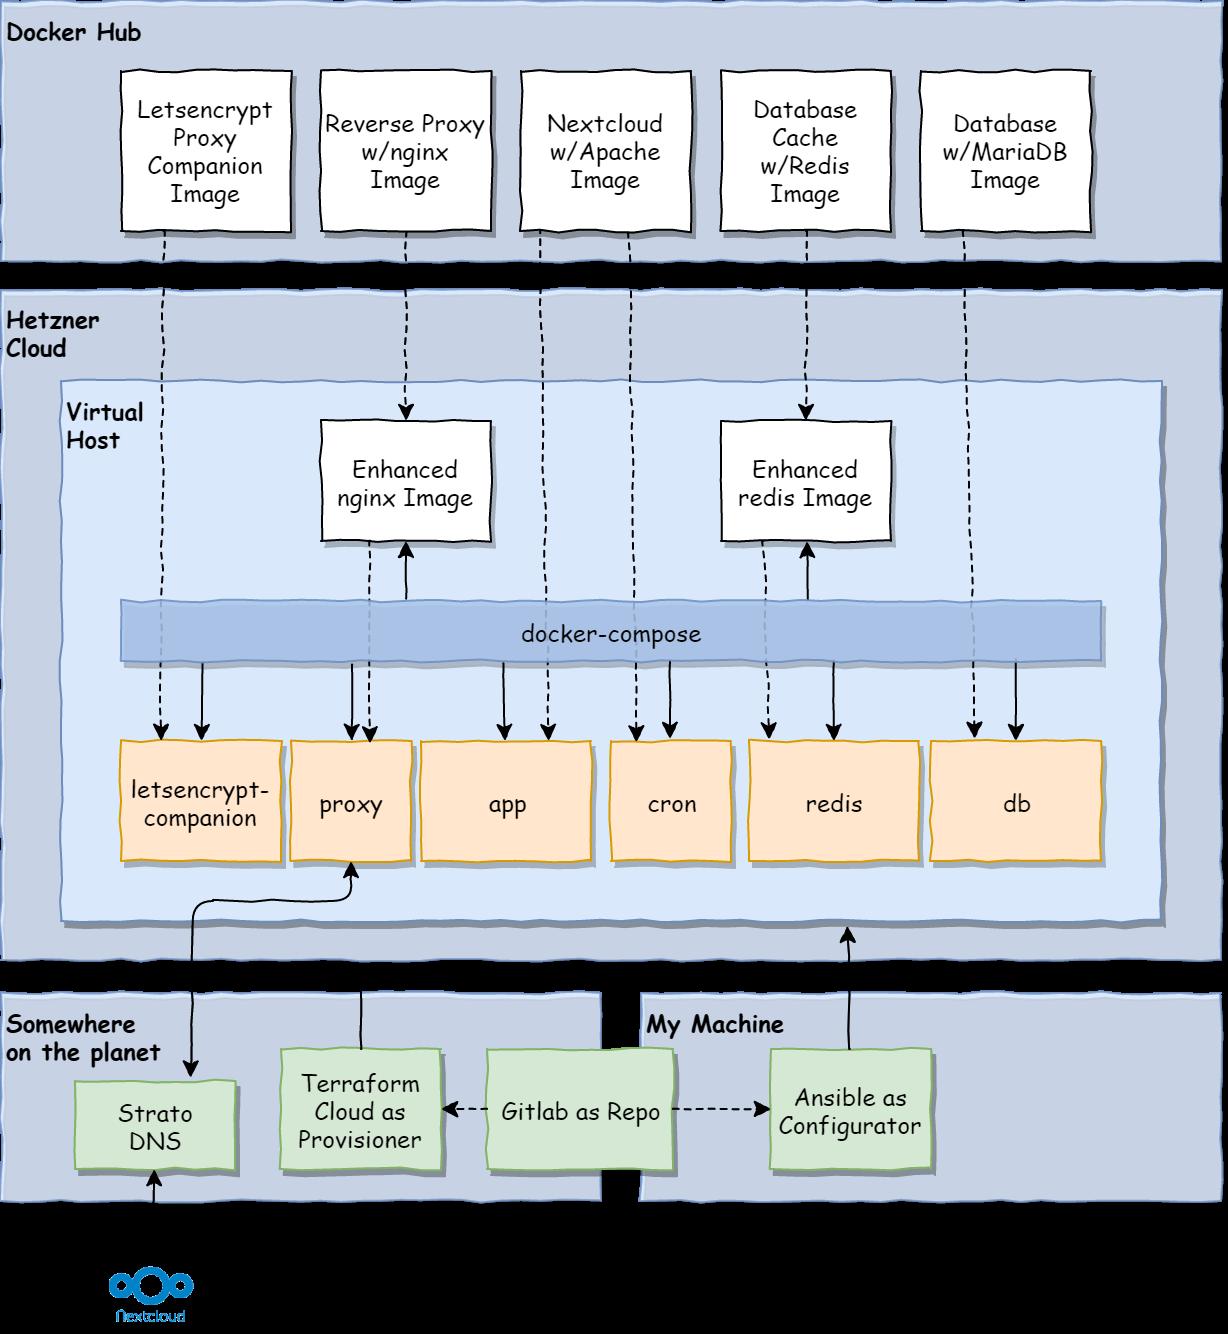 nextcloud target architecture